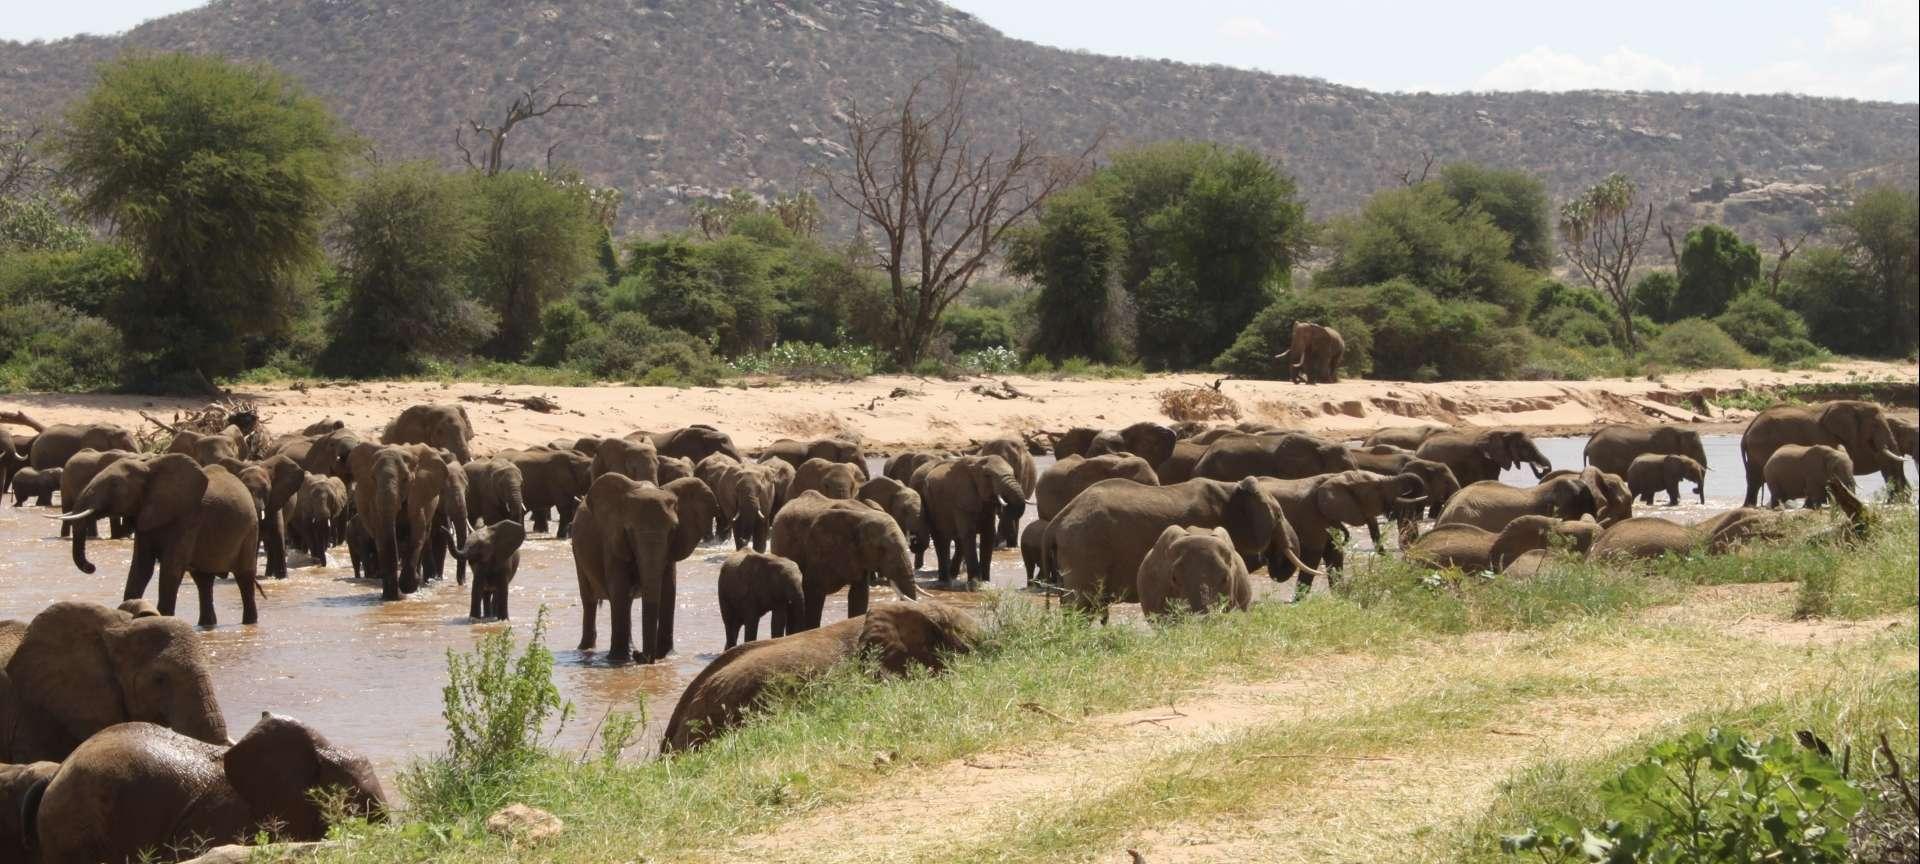 Samburu Buffalo Springs National Park Safaris, Tours And